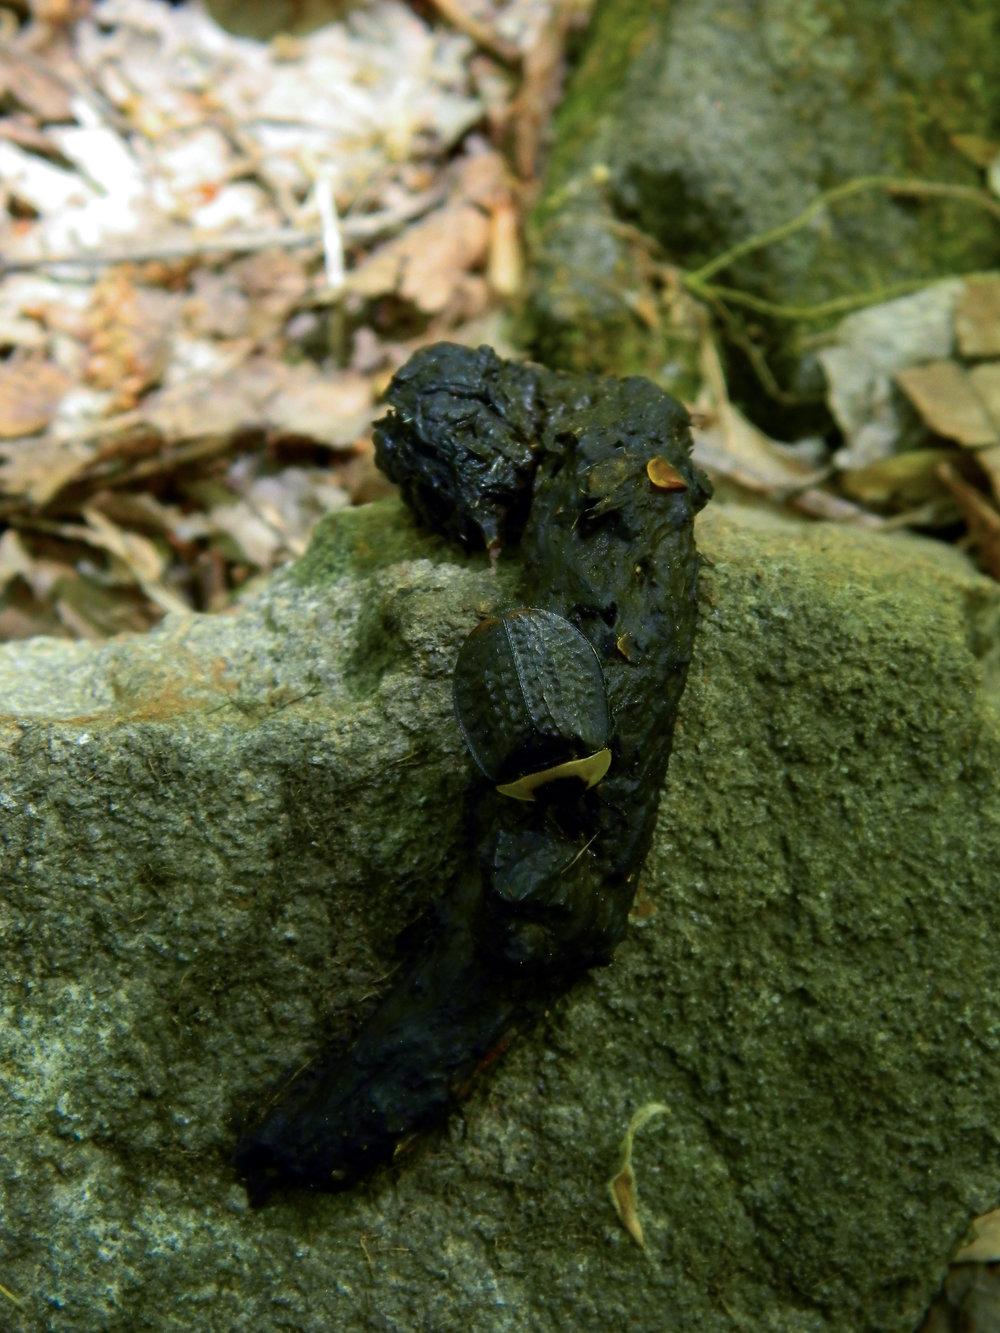 America Carrion Beetle | Bellaire Woods |© 2013 Jessica Allen